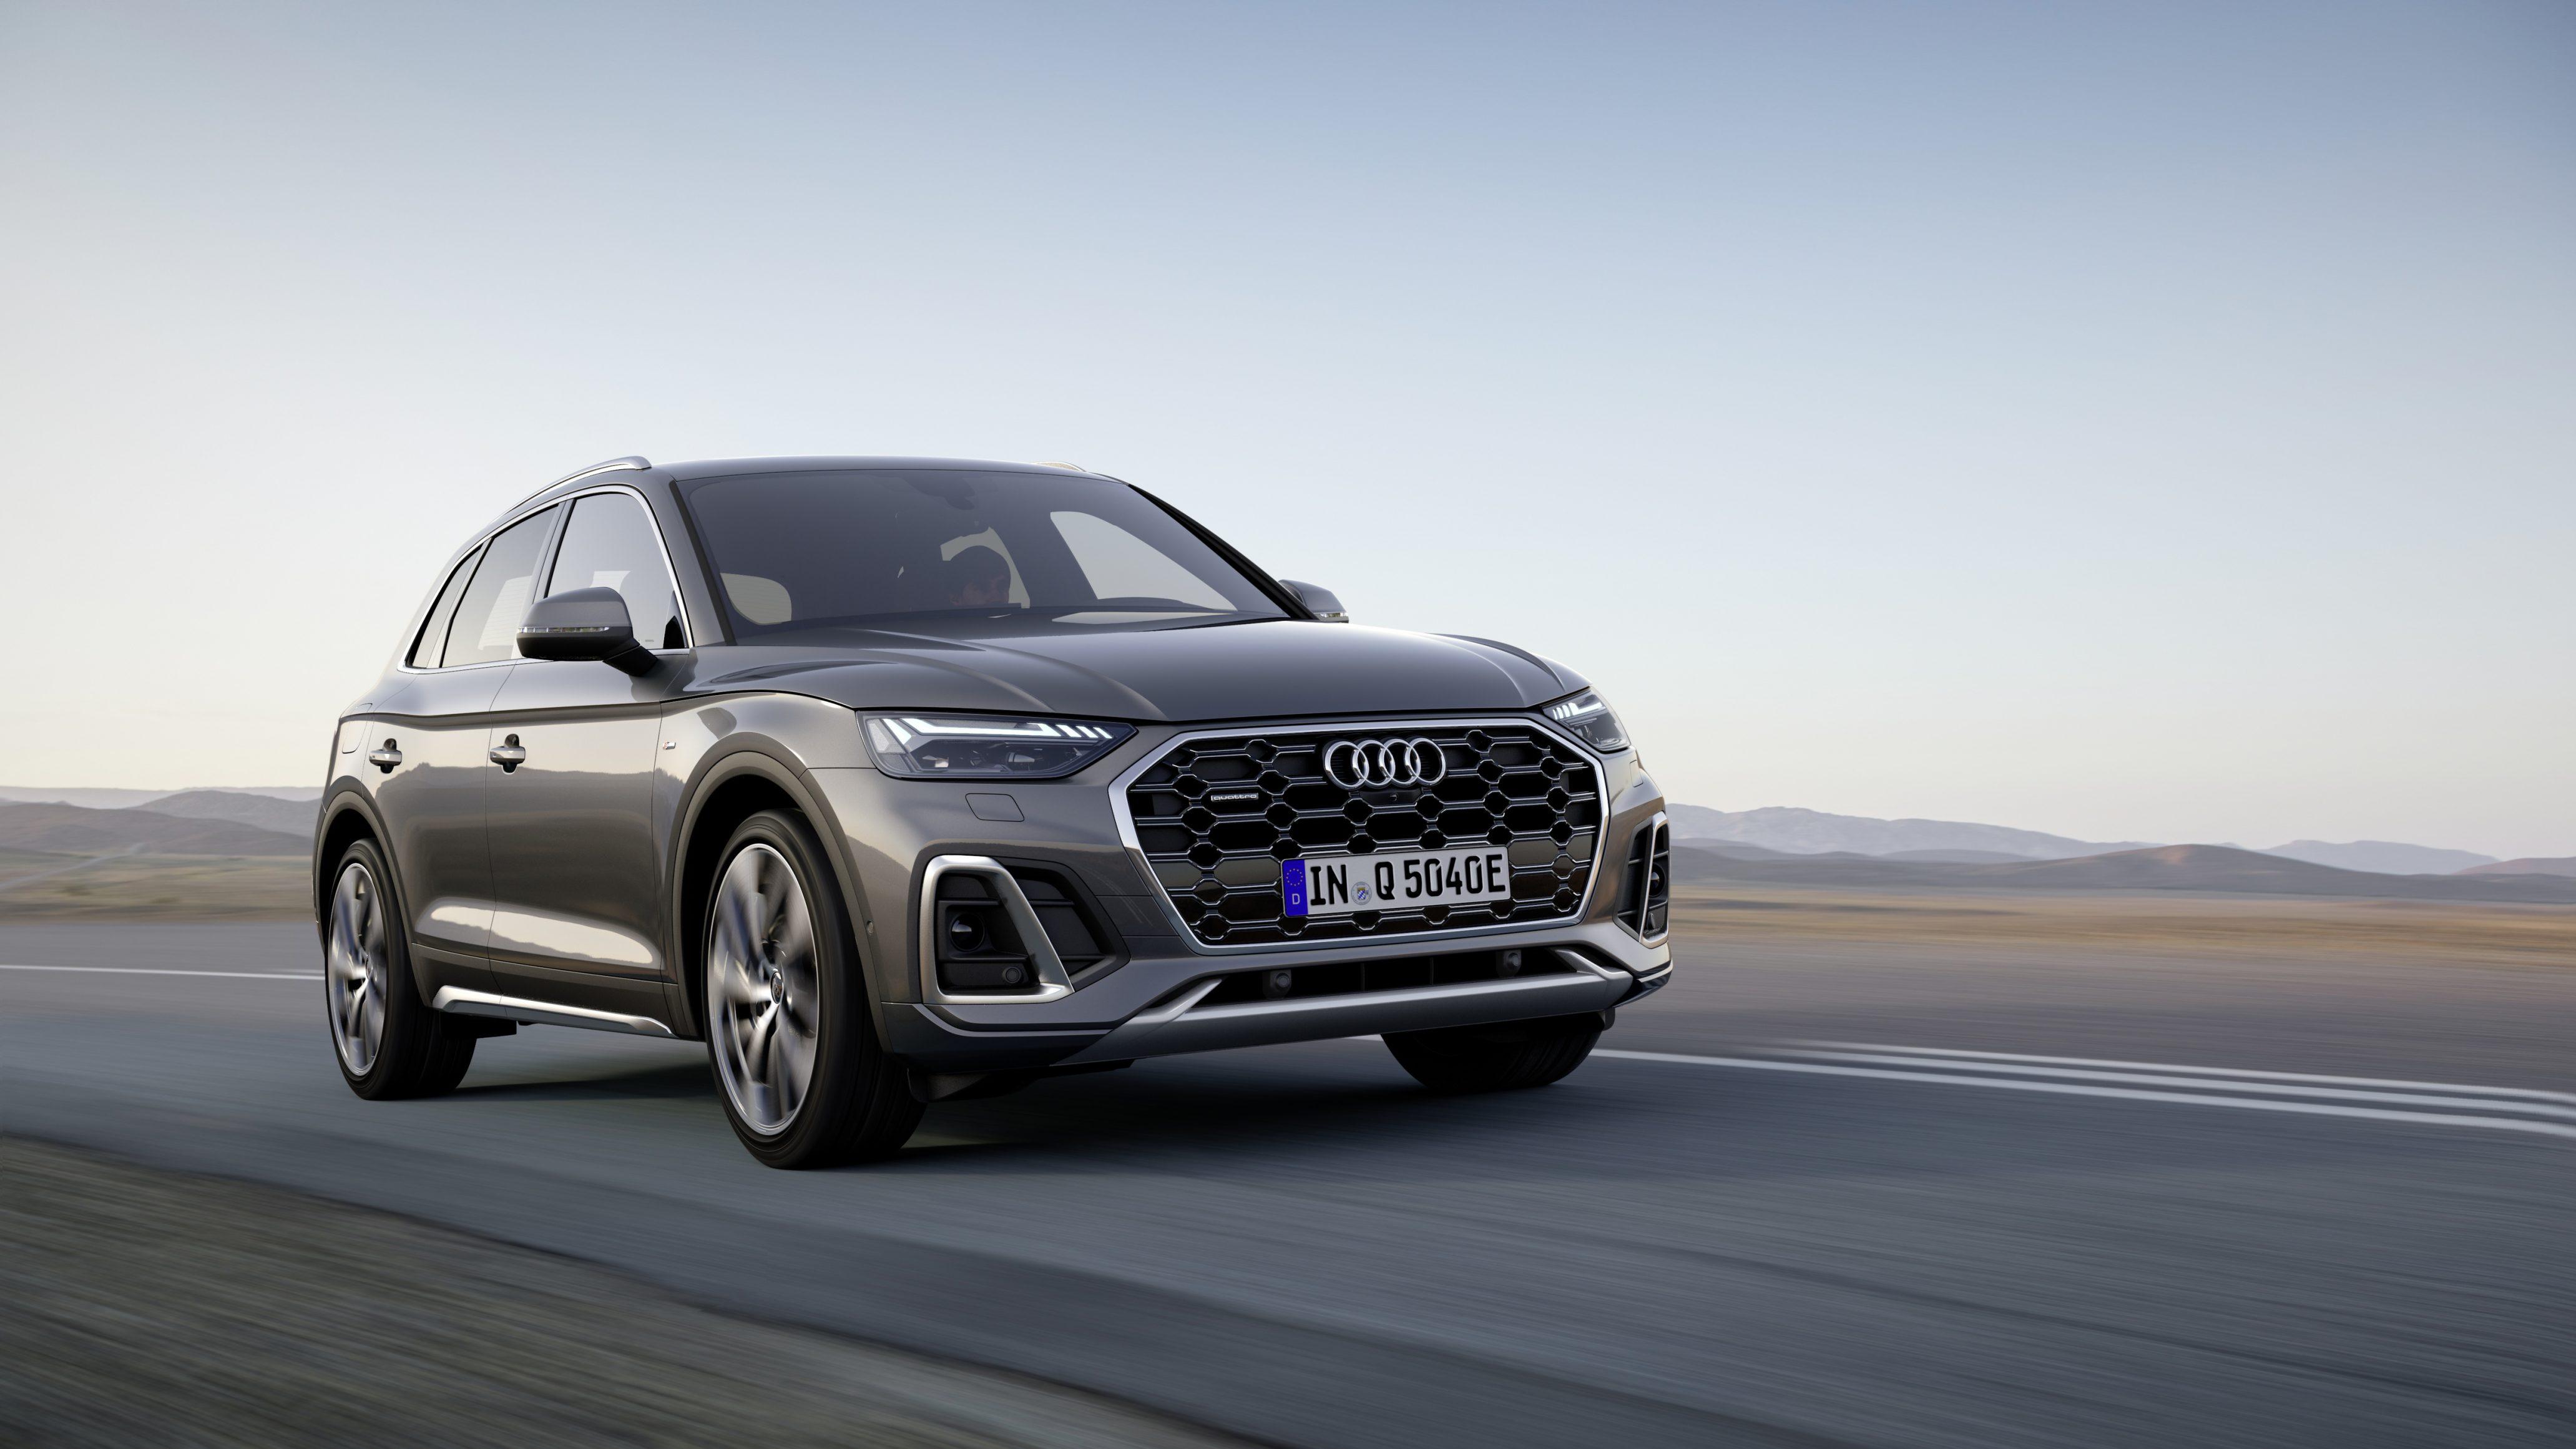 Audi Q5 driving through the desert